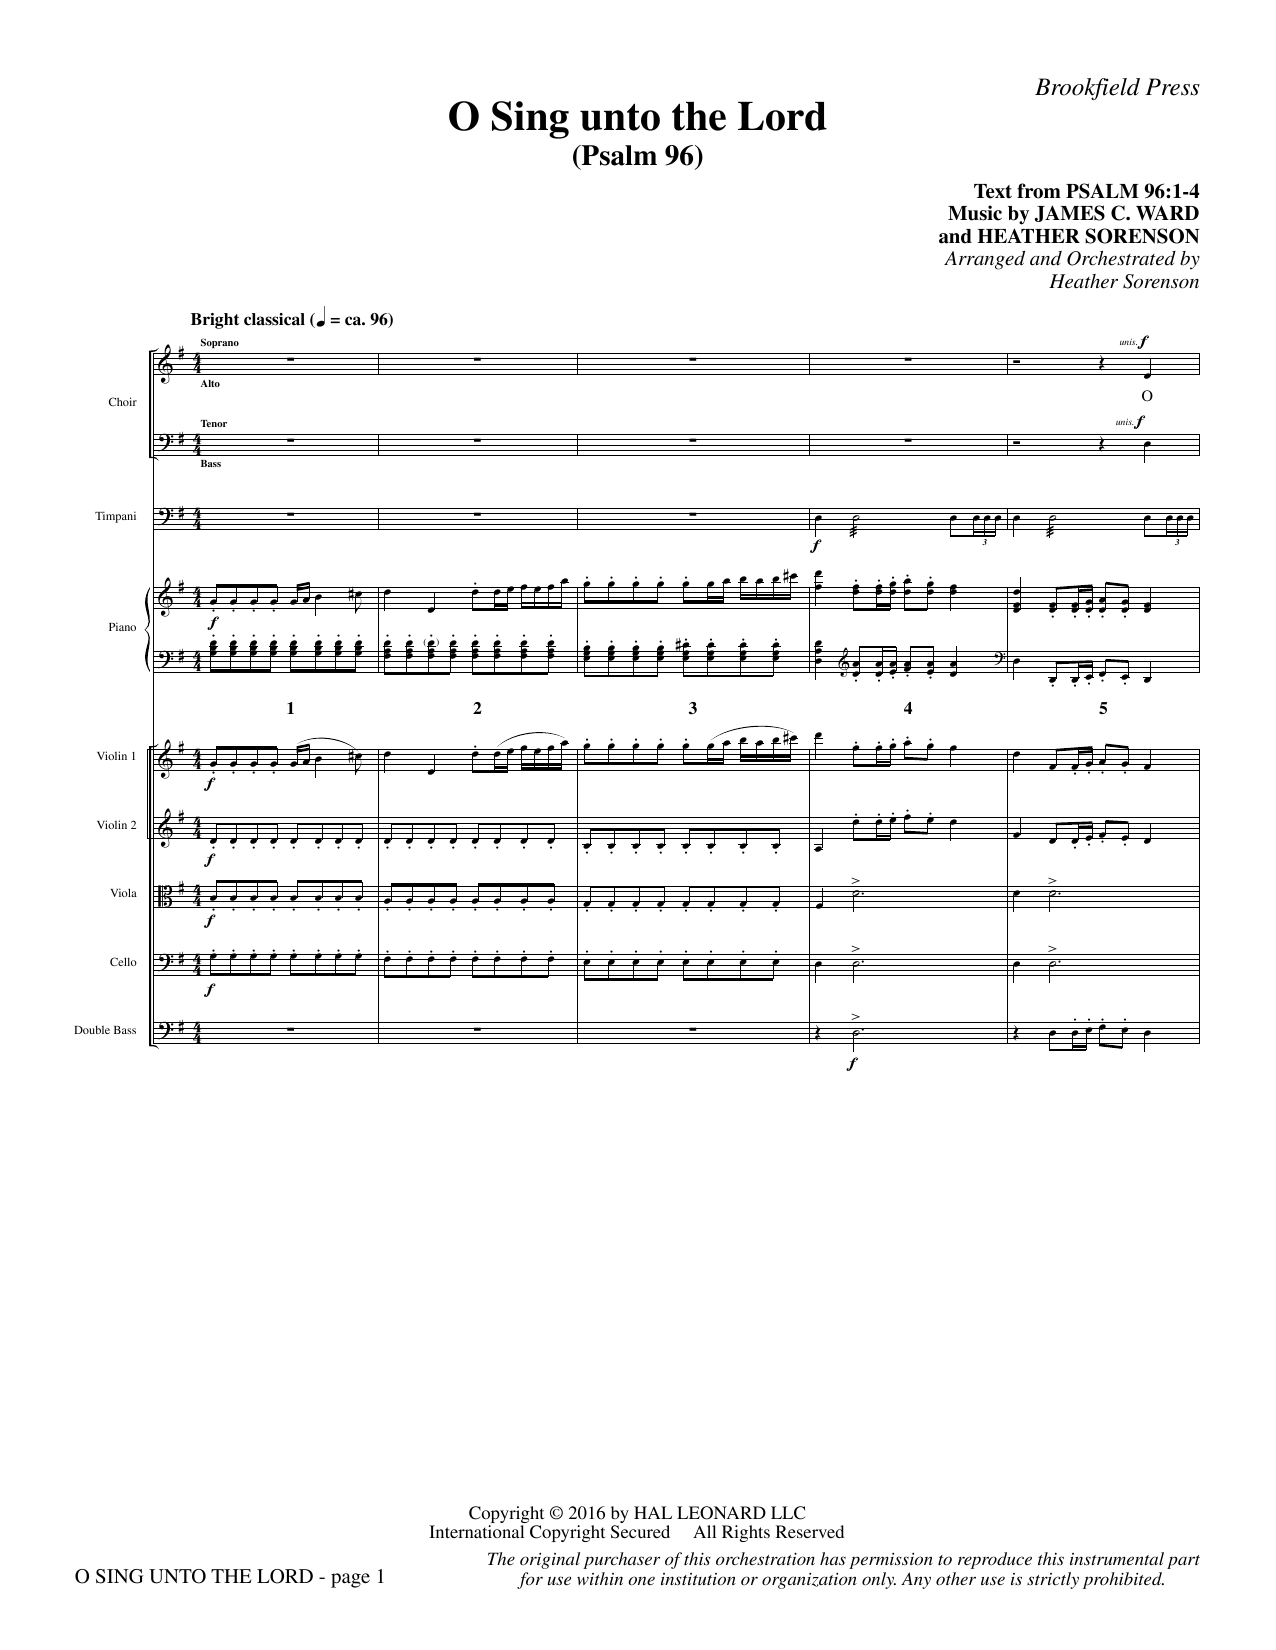 O Sing Unto the Lord - Full Score Sheet Music